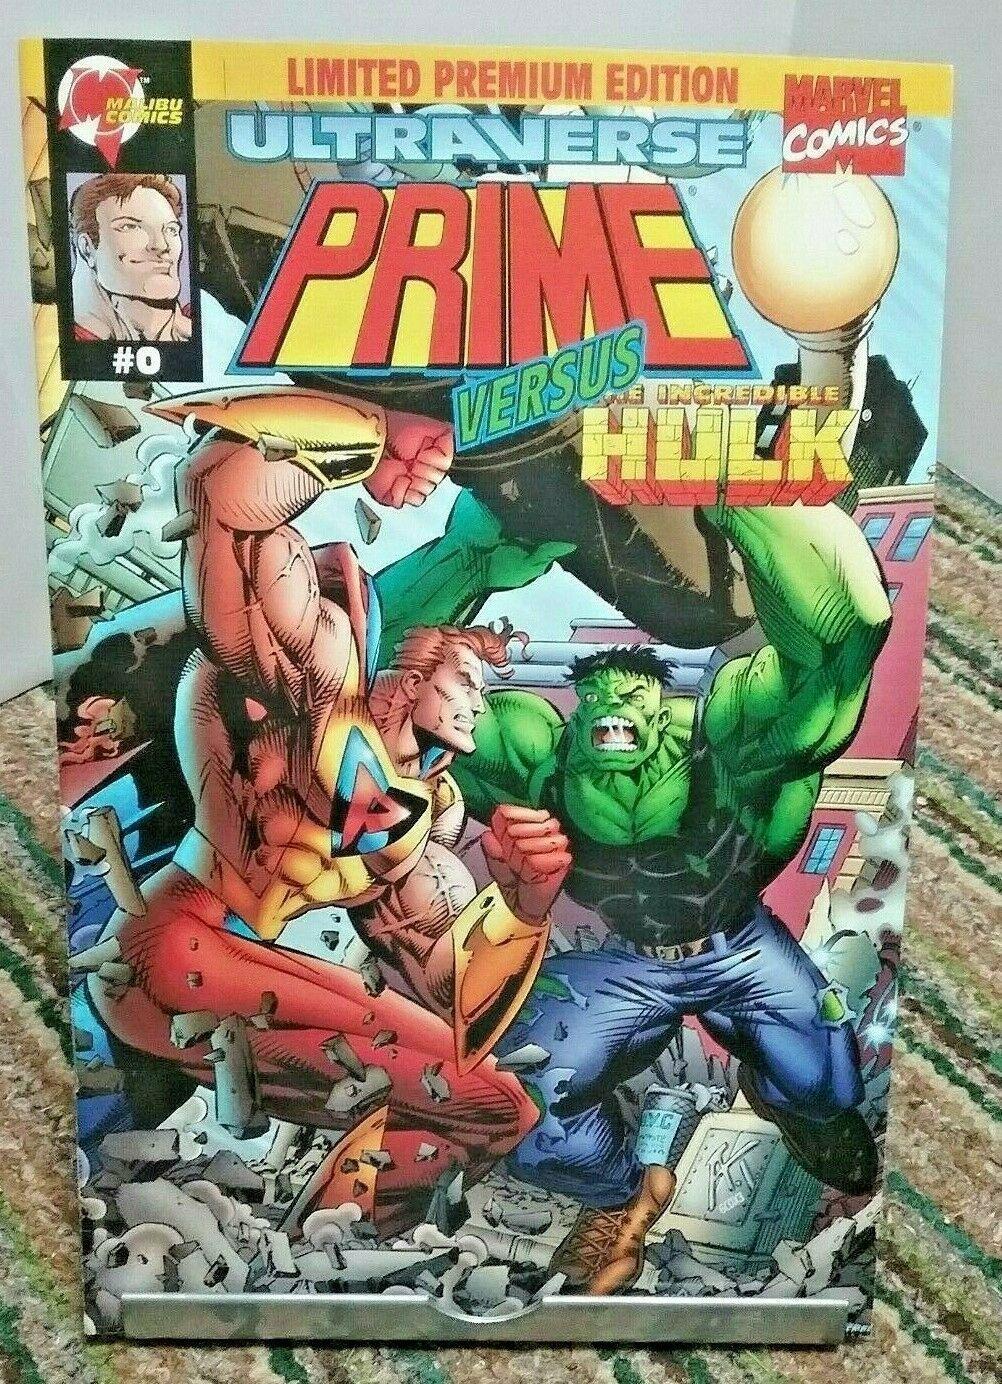 Prime Vs Incredible Hulk Malibu Marvel Comics Issue 0 July 1995